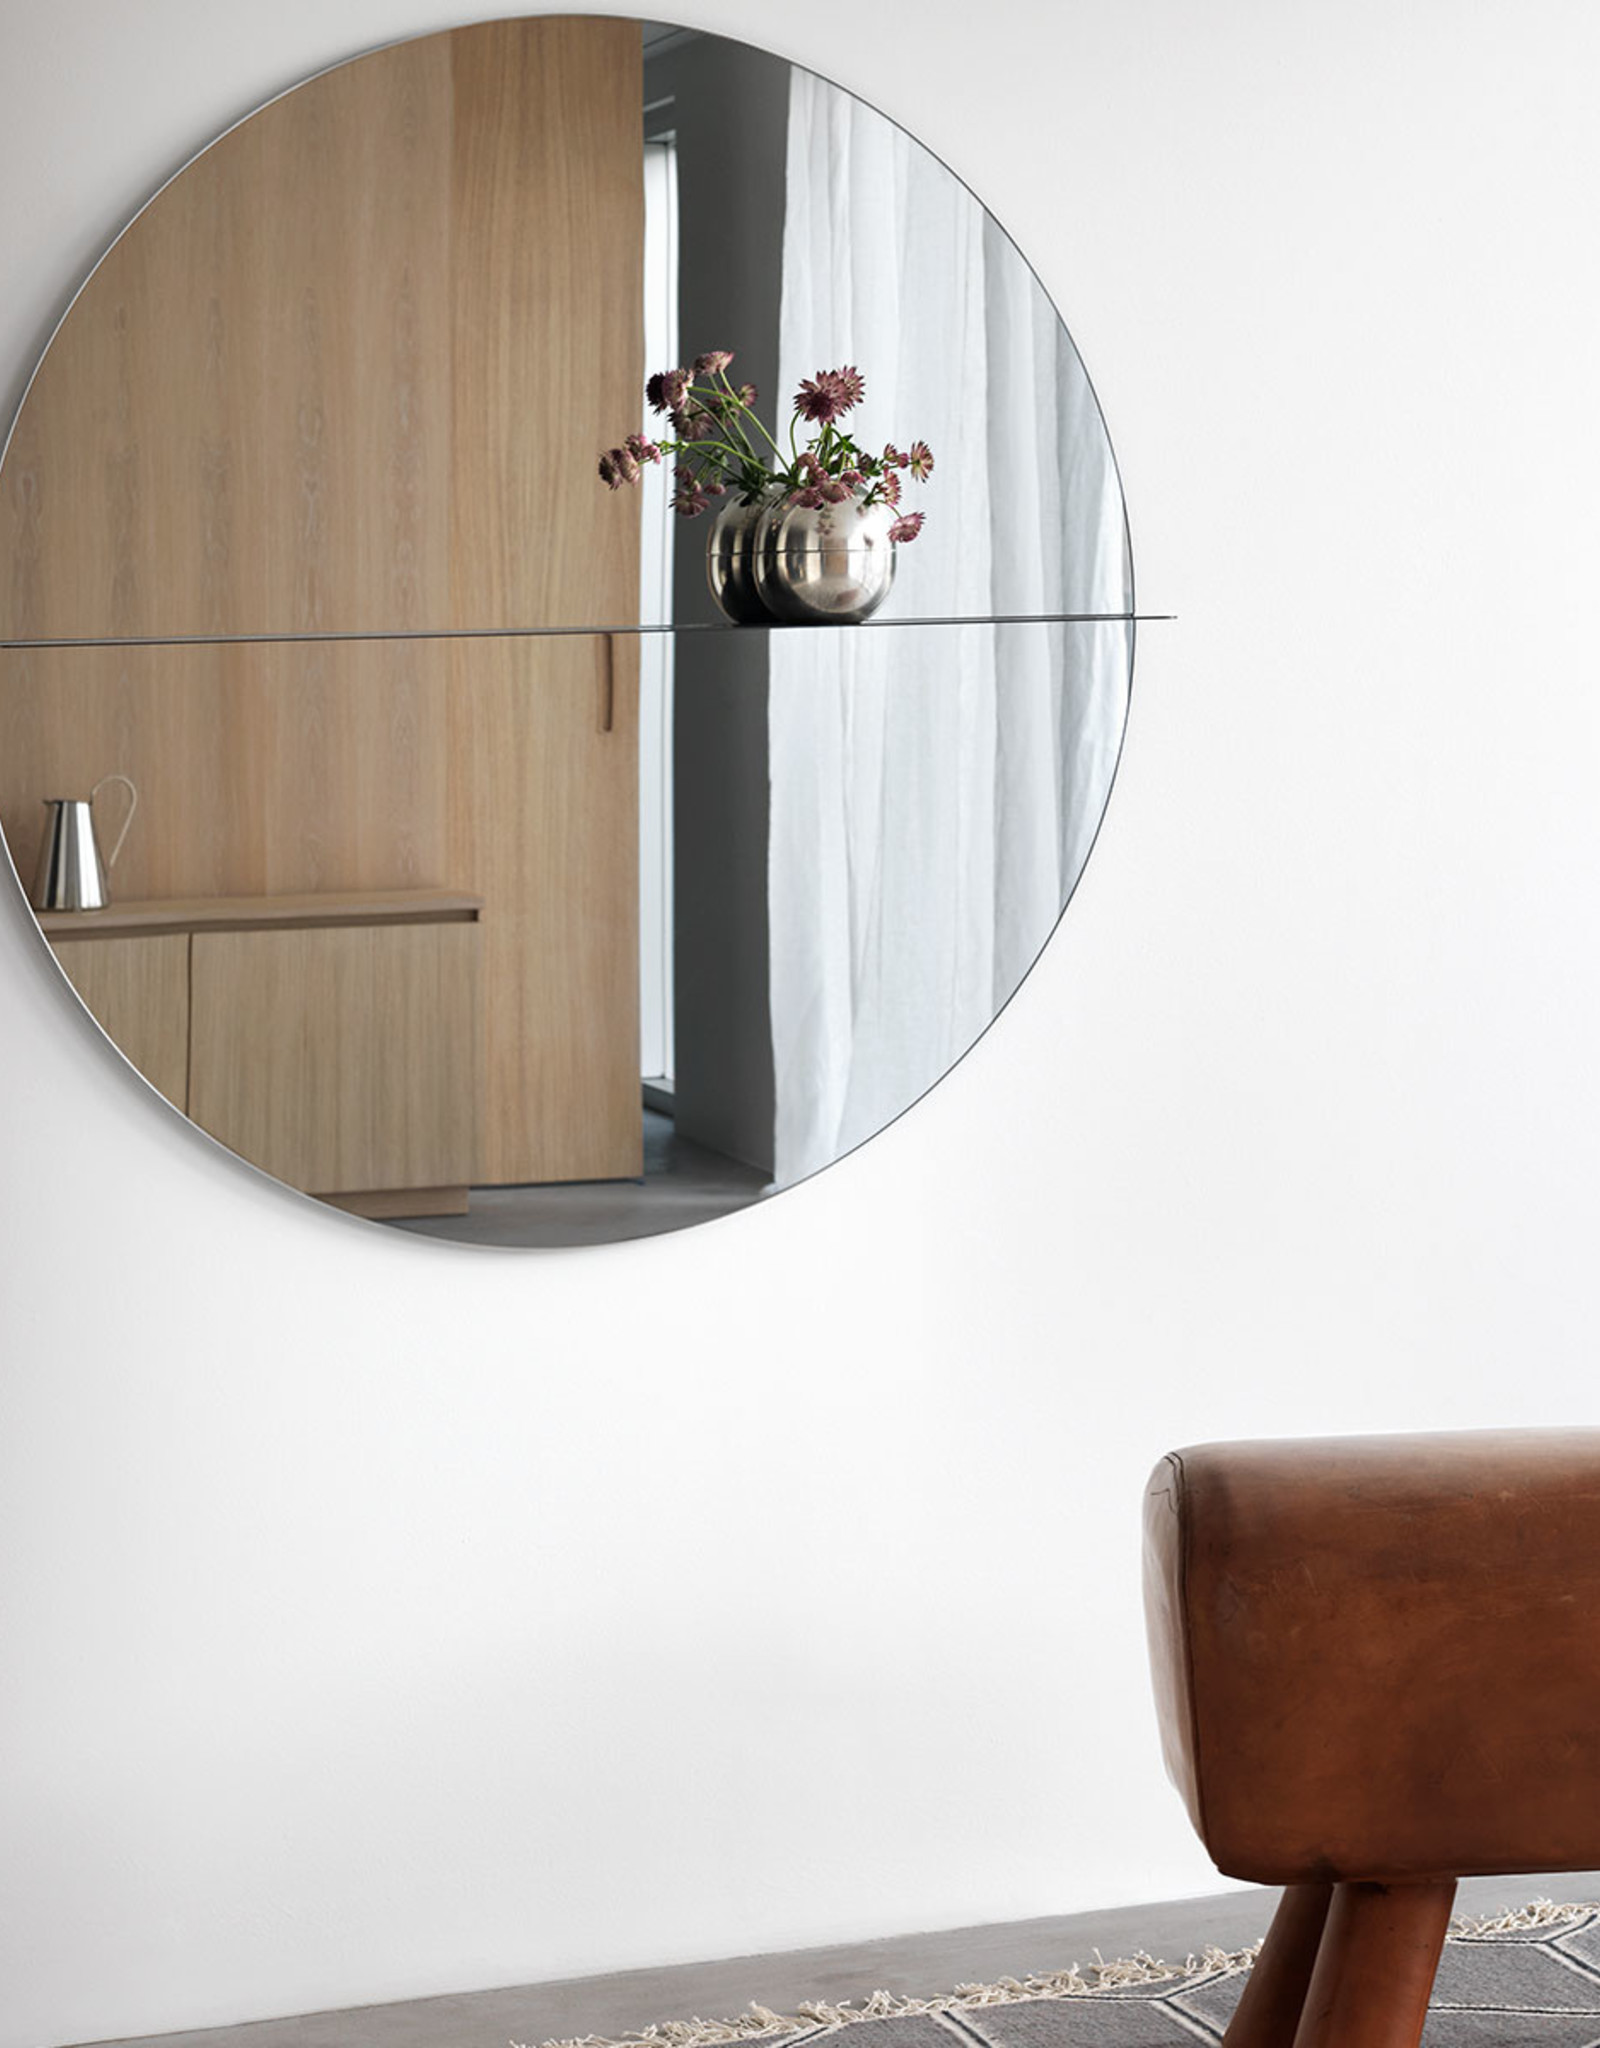 Otto mirror by Anya Sebton & Eva Lilja Löwenhielm